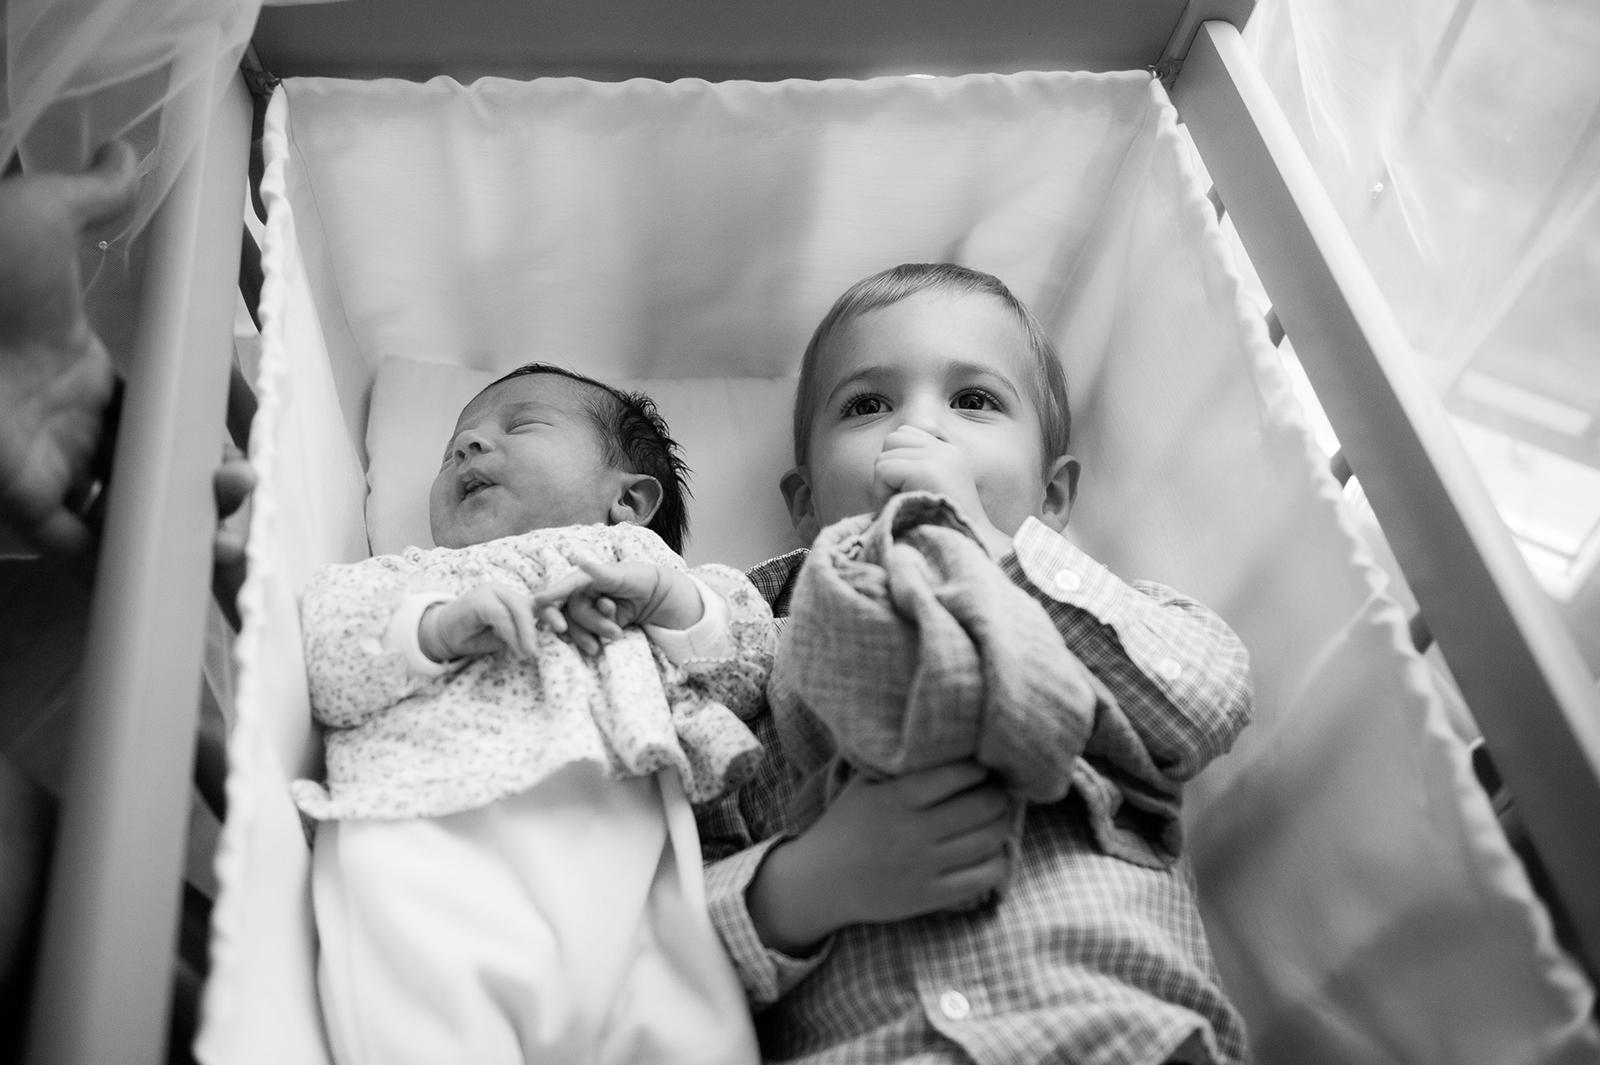 seance-photo-famille-photo-grossesse-photo-bébé-naissance-sabrina-godemert-photographe-seine-et-marne025